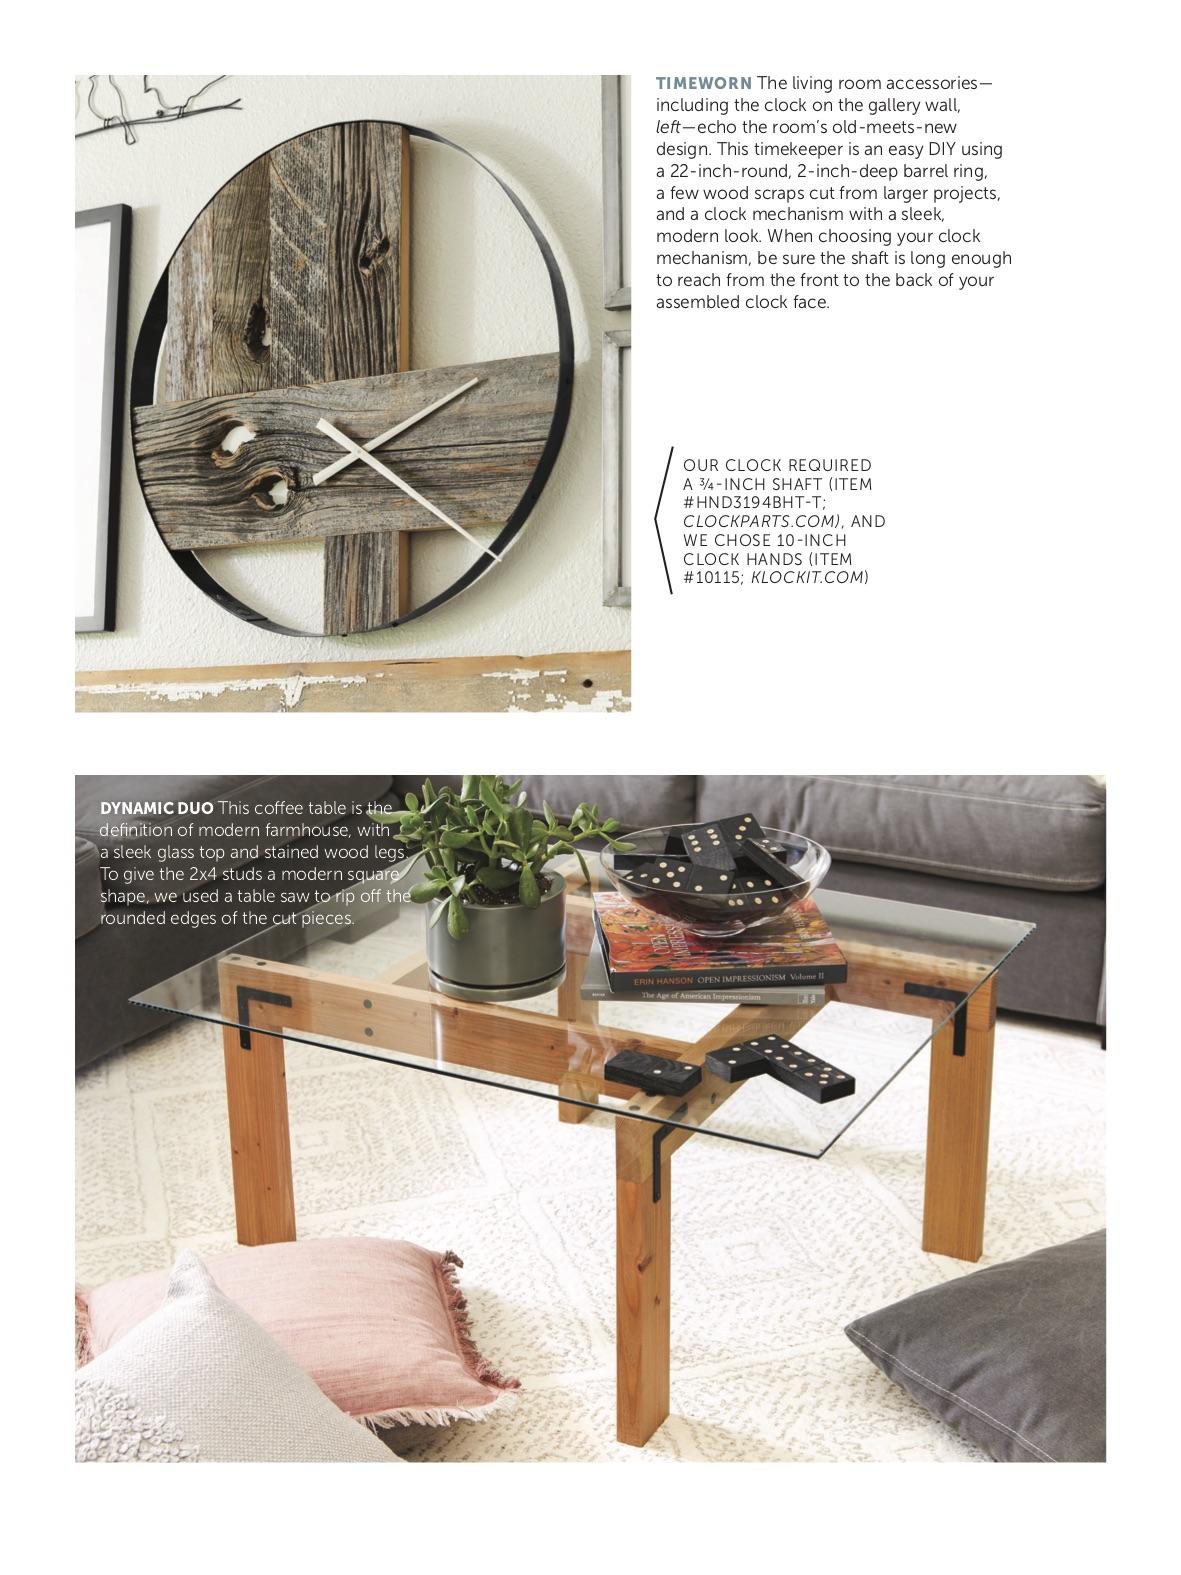 080-087 DIY1619 Mod Farmhouse Schmidt Living Room3.jpg